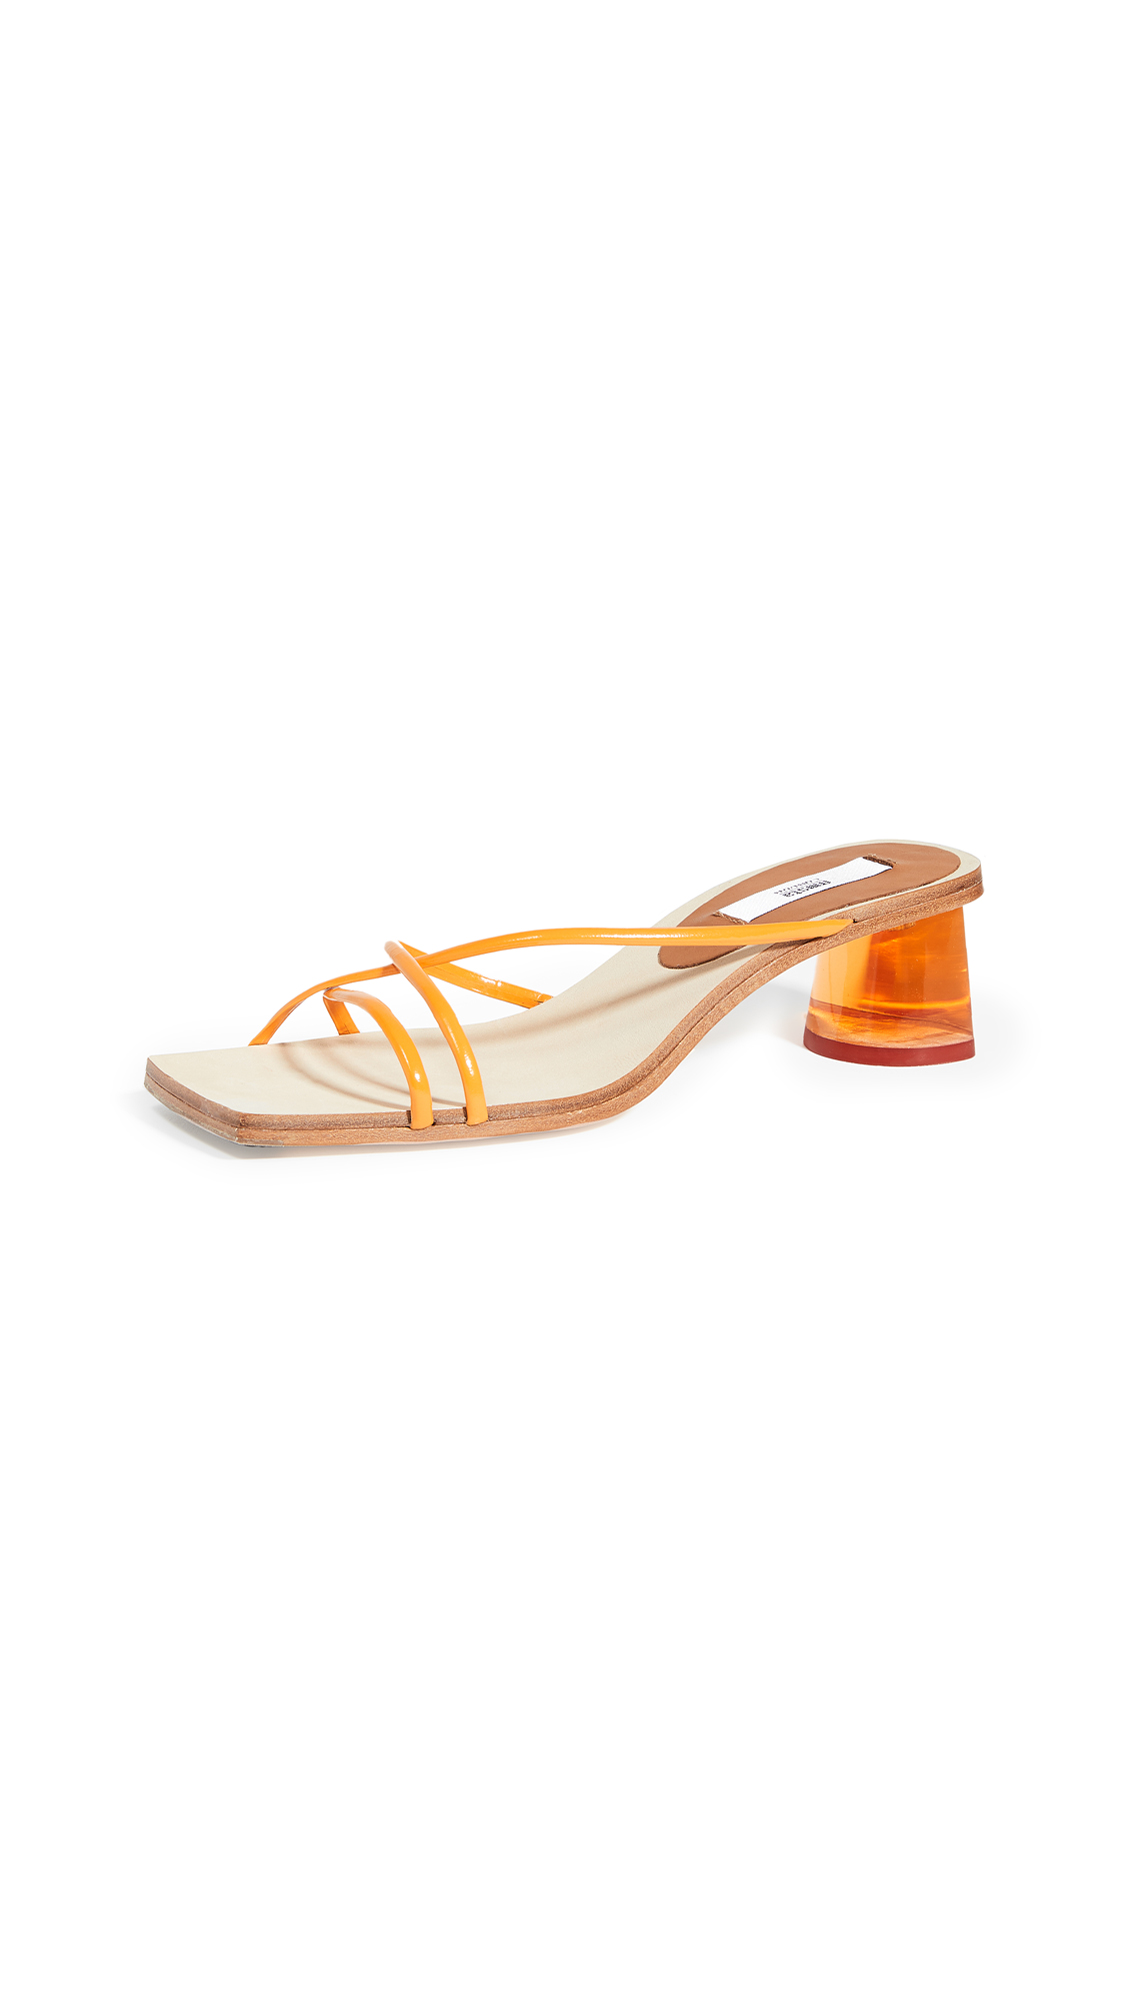 Buy Miista Nikki Slides online, shop Miista